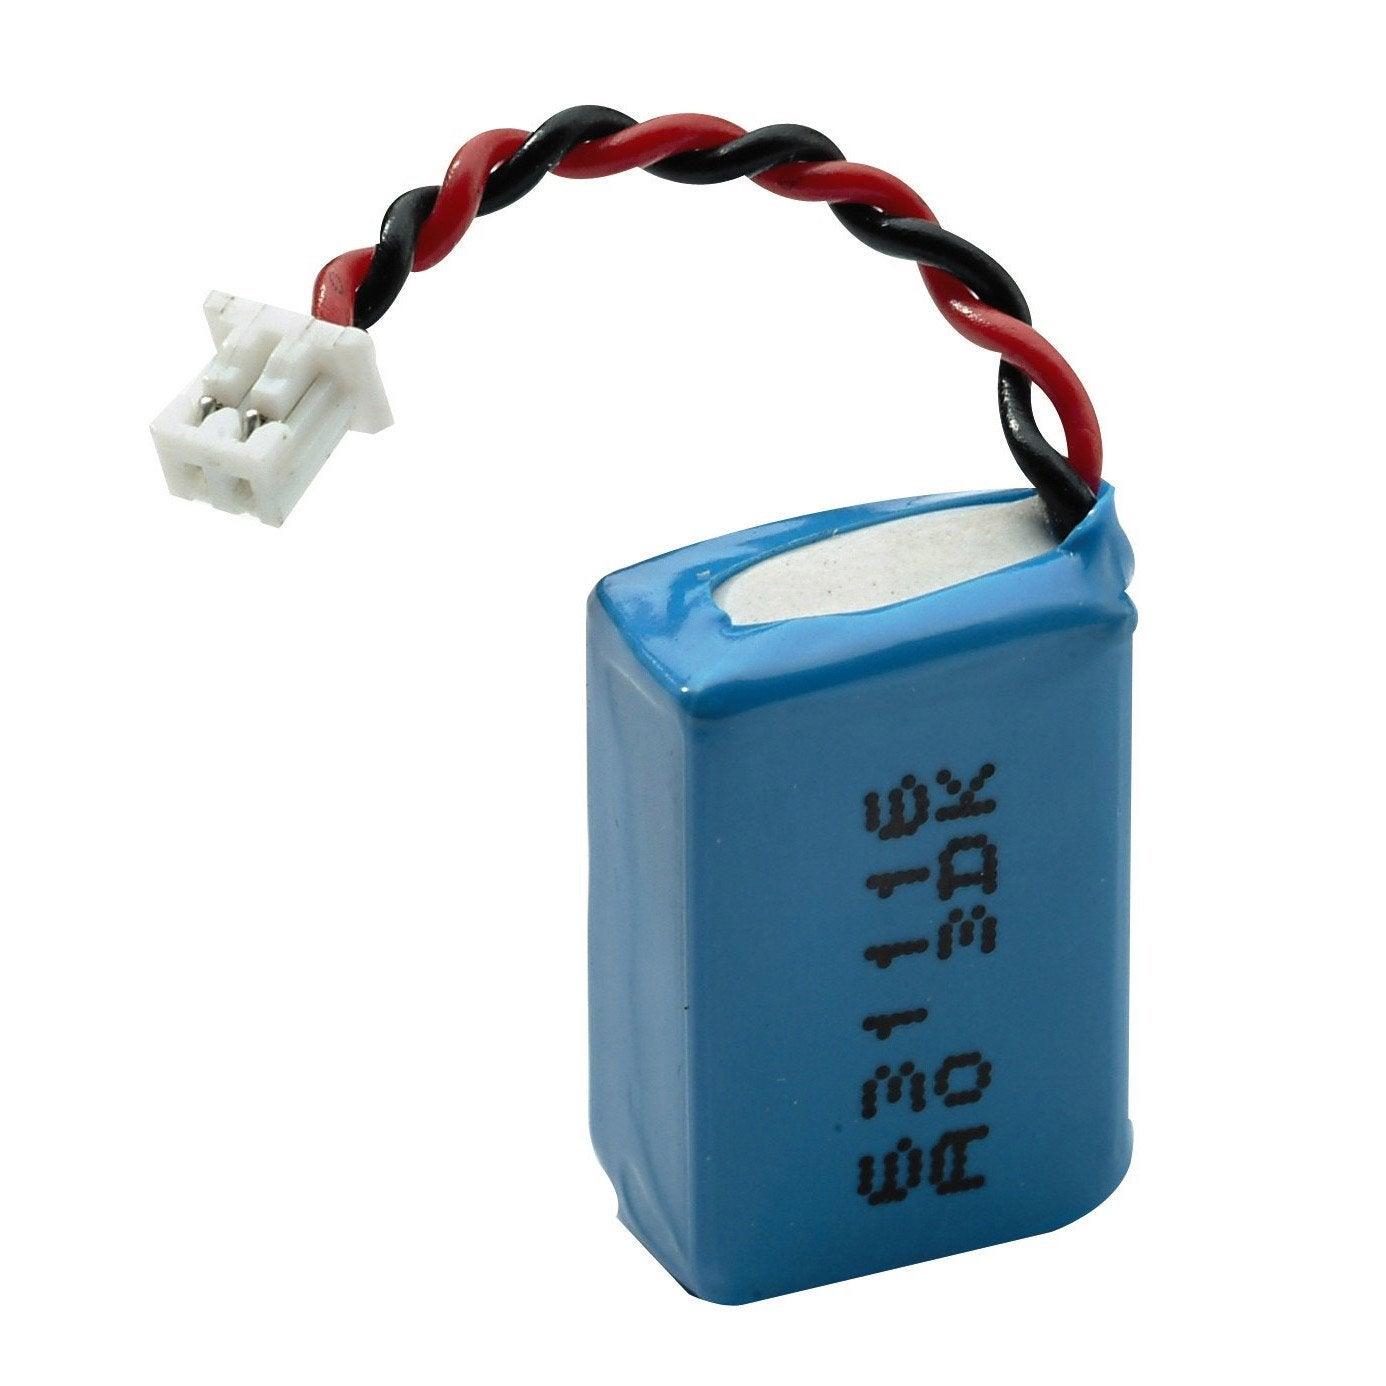 Batterie li ion diagral diag44acx leroy merlin - Diagral leroy merlin ...